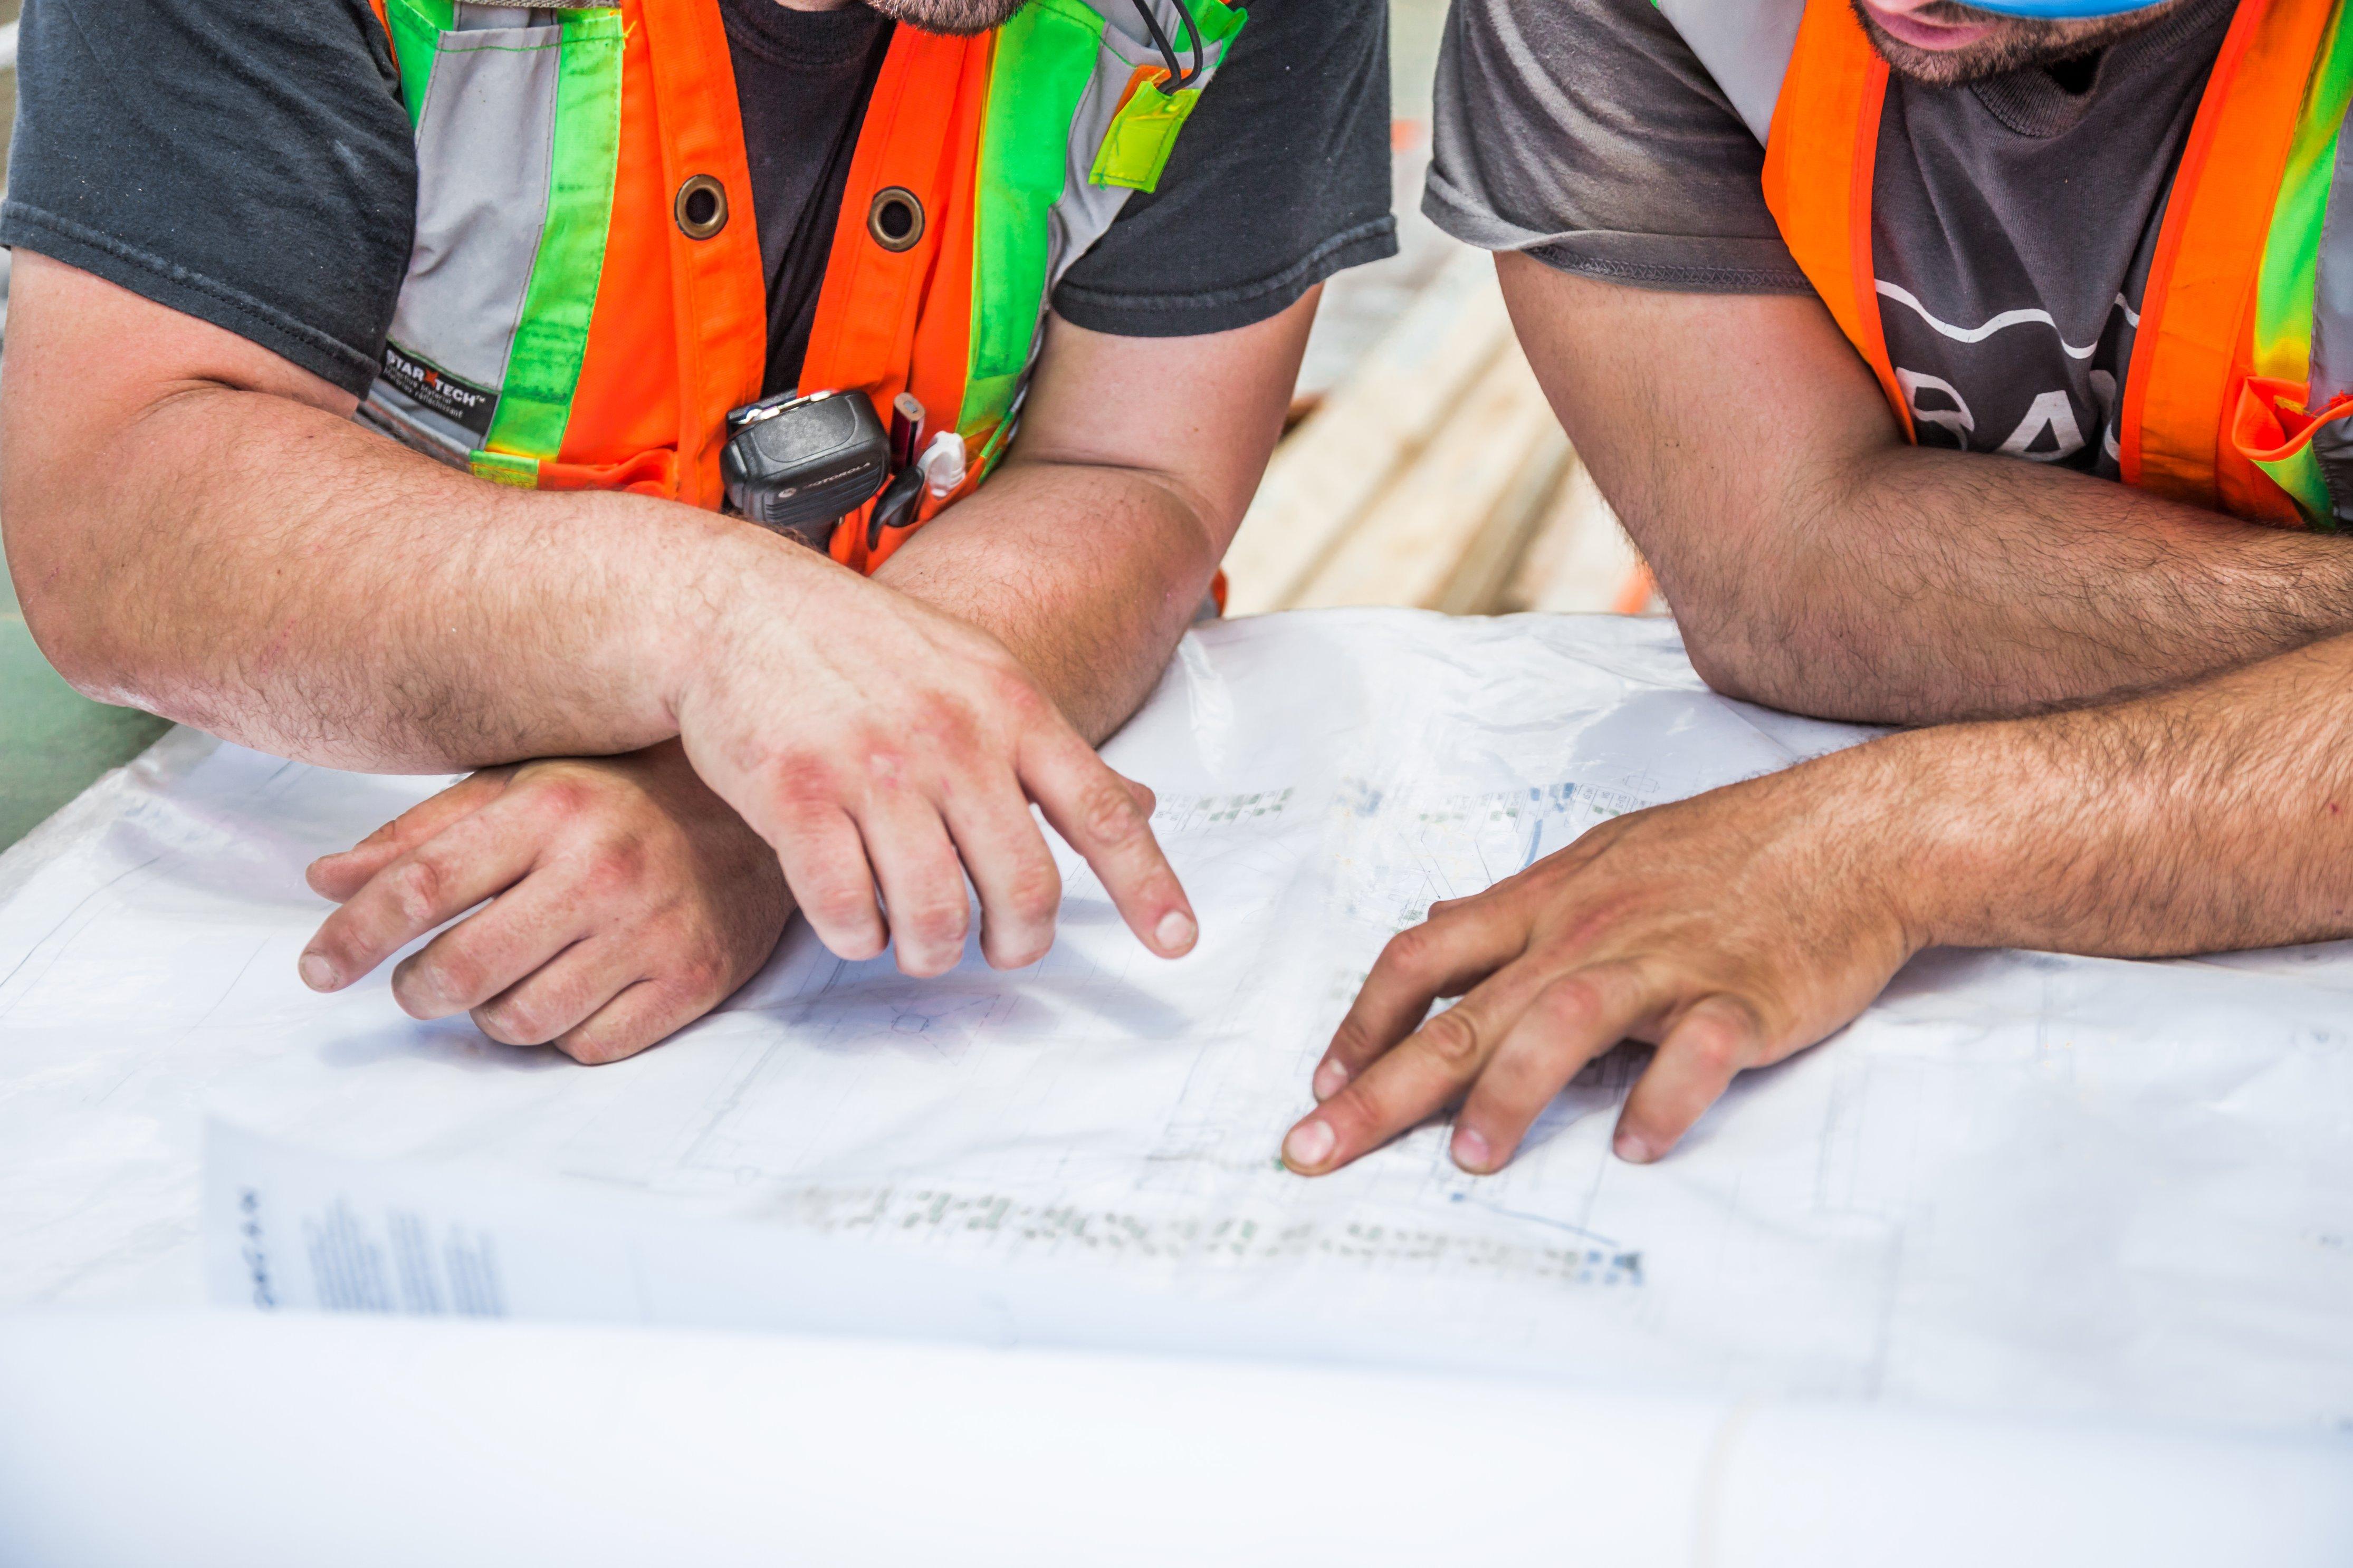 hands-on-blueprints